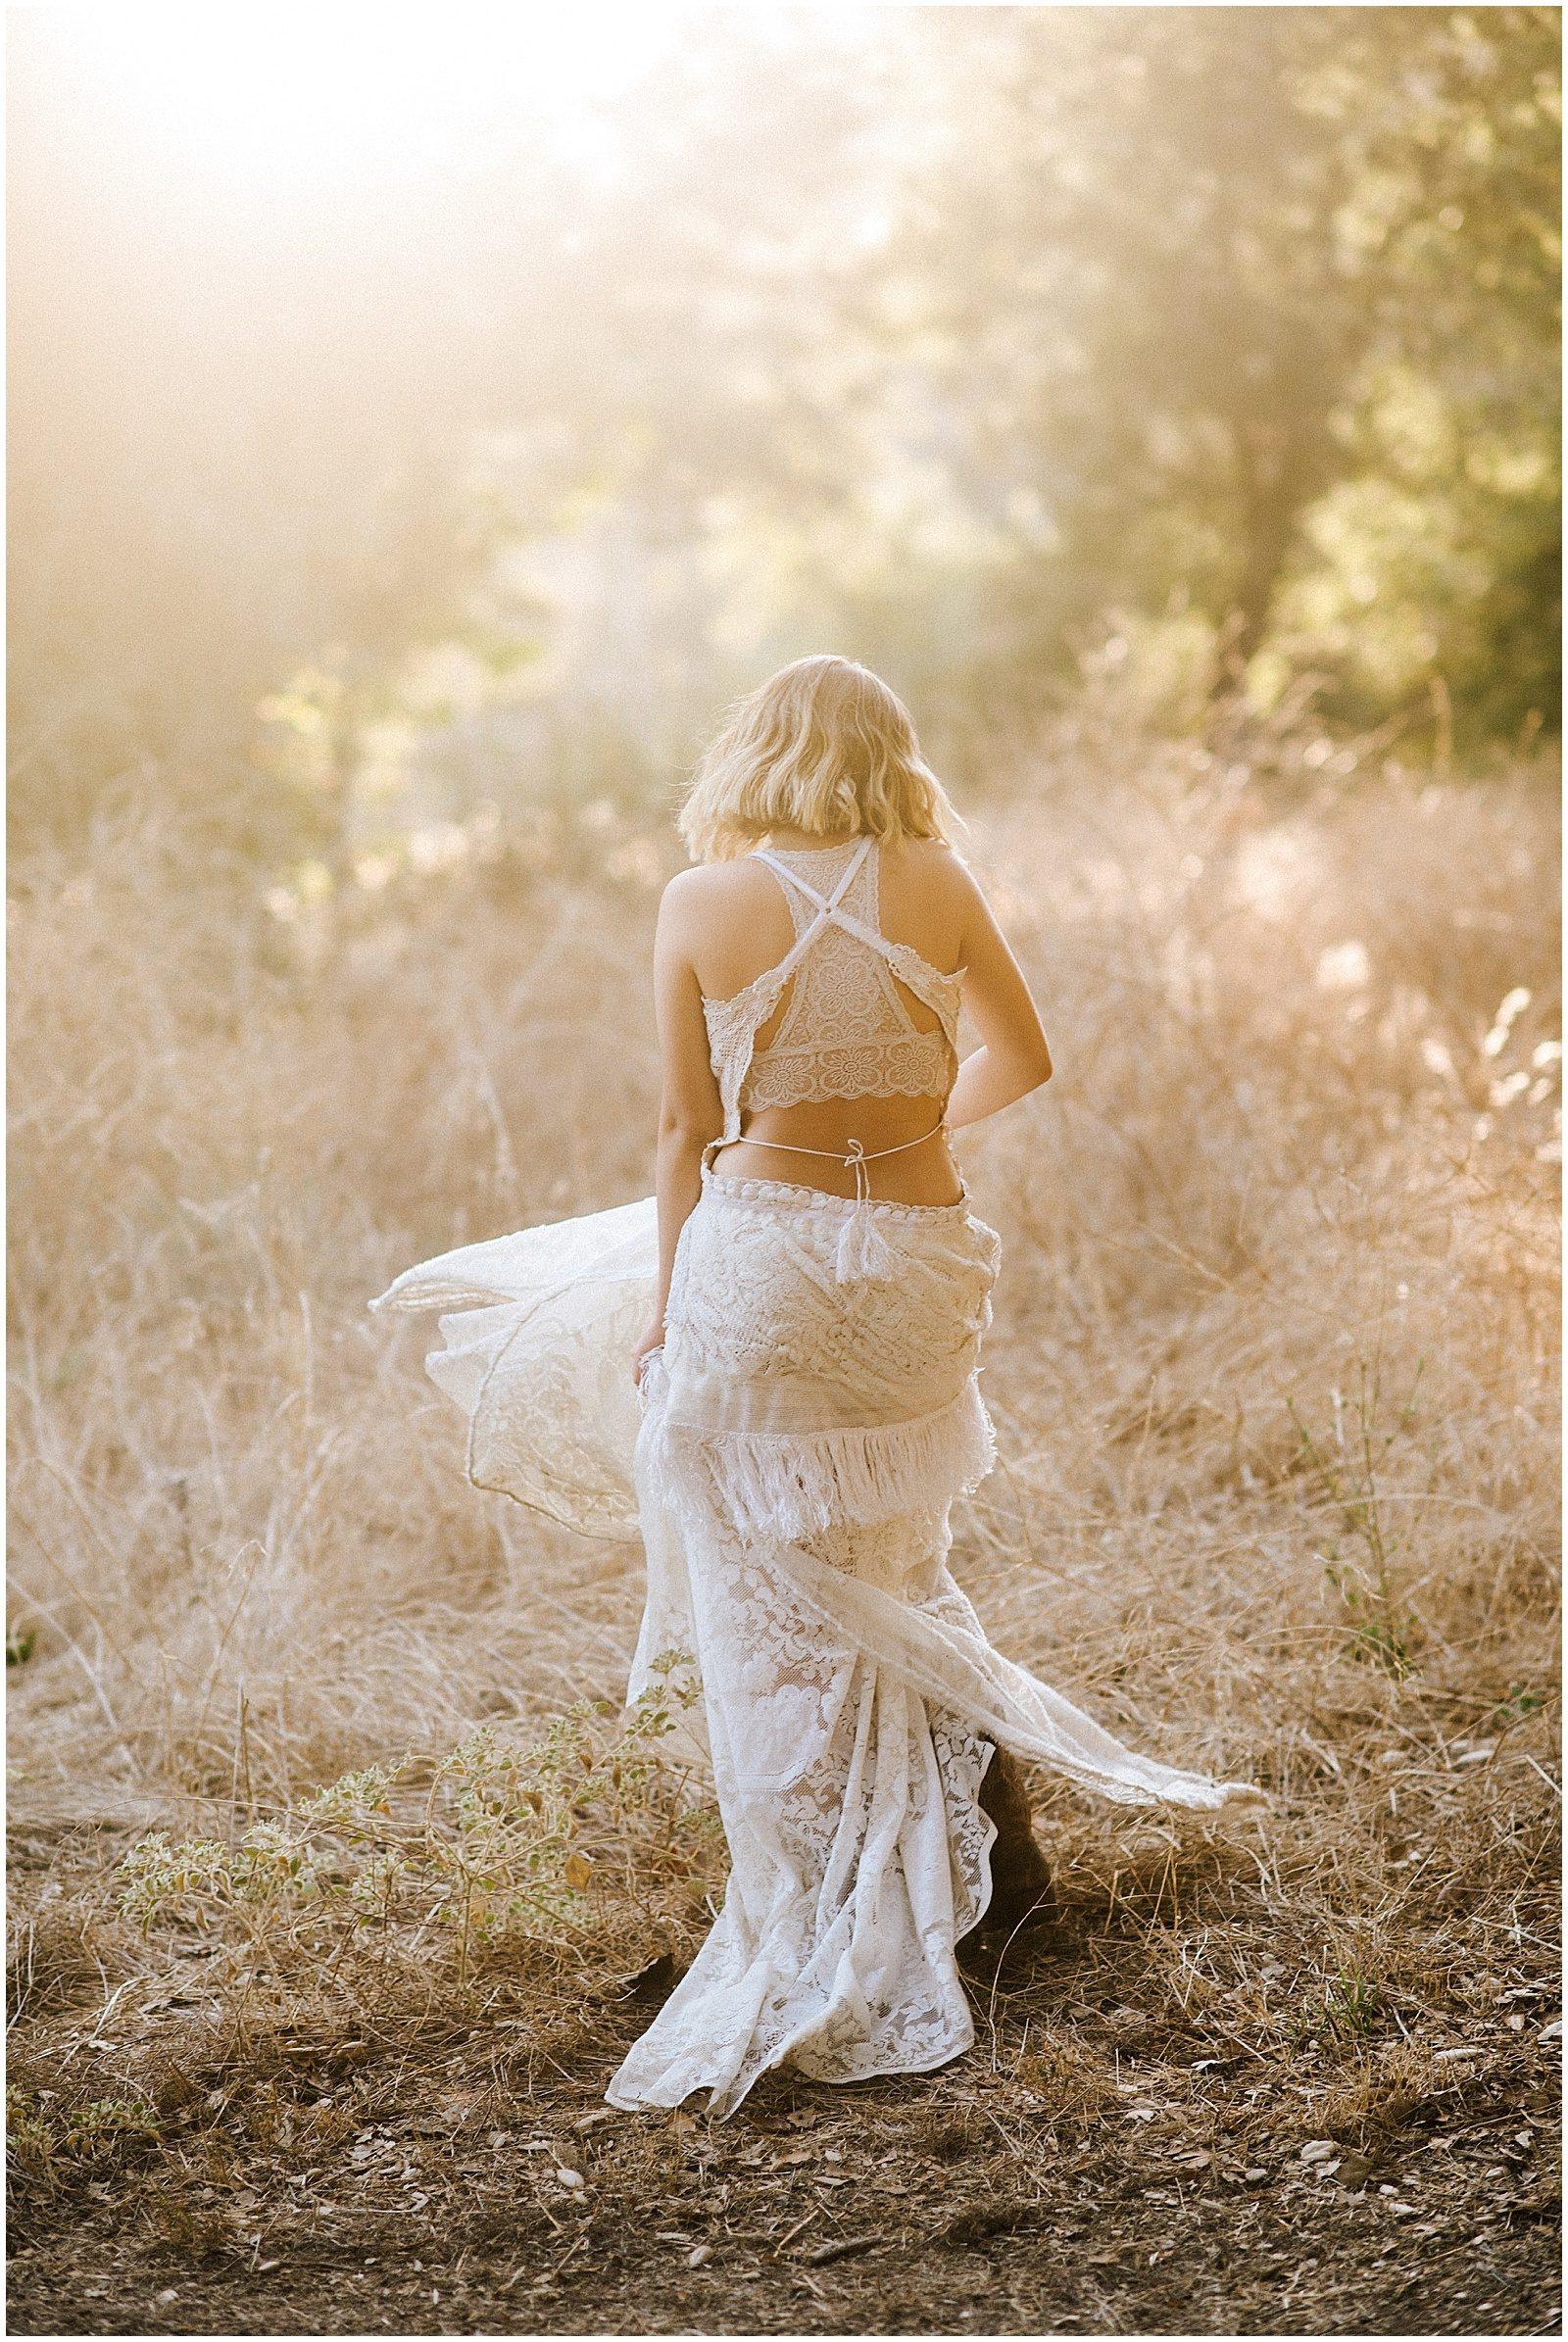 Orange County Family Photographer Travelling Reclamation Dress 0259